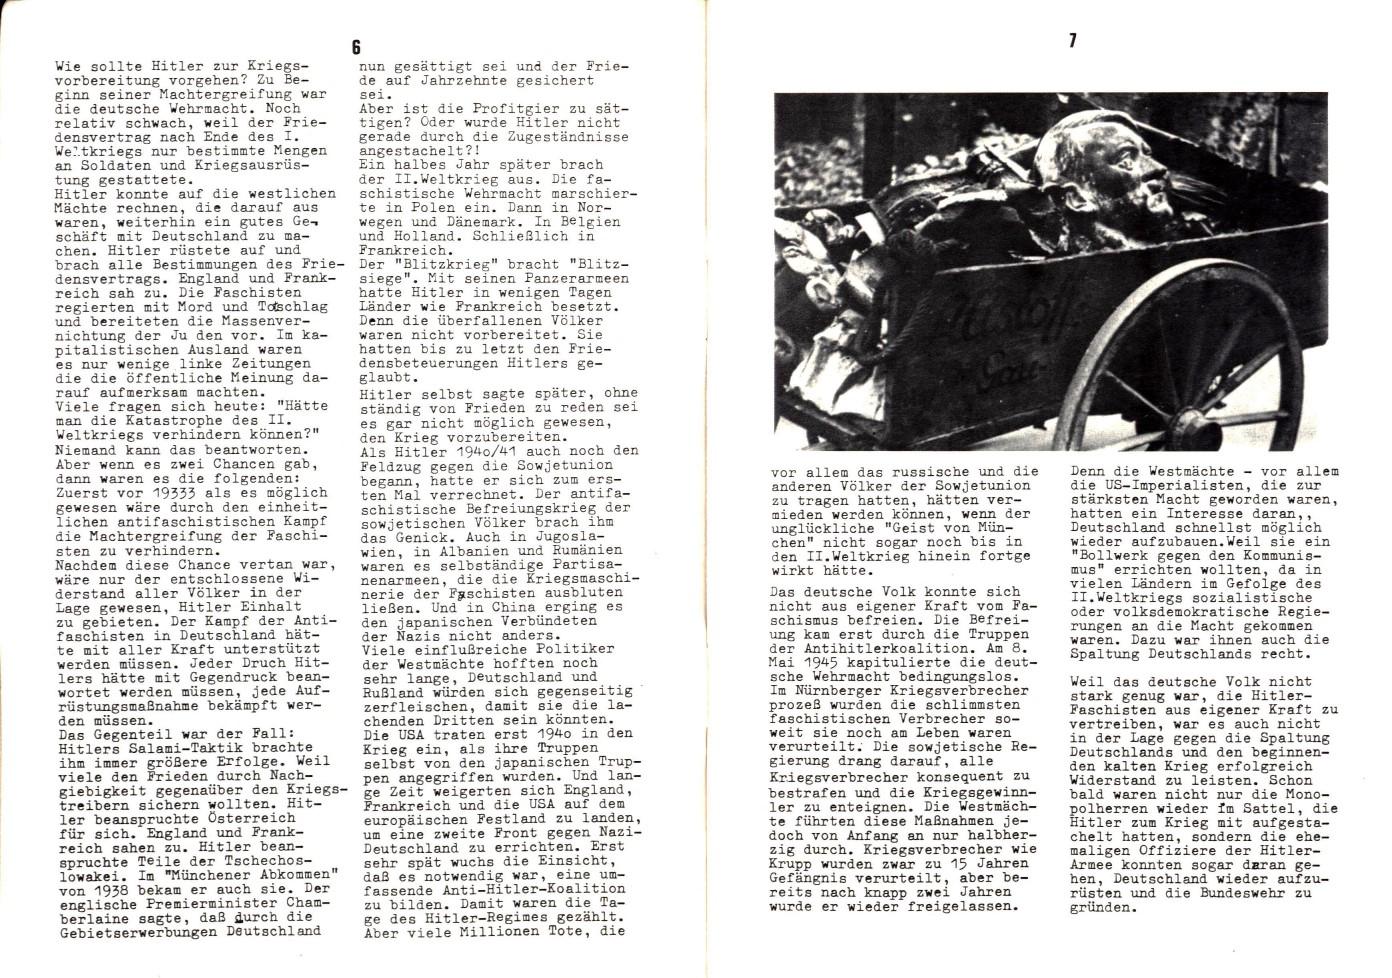 KJVD_1979_Dokumente_zum_Antikriegstag_05